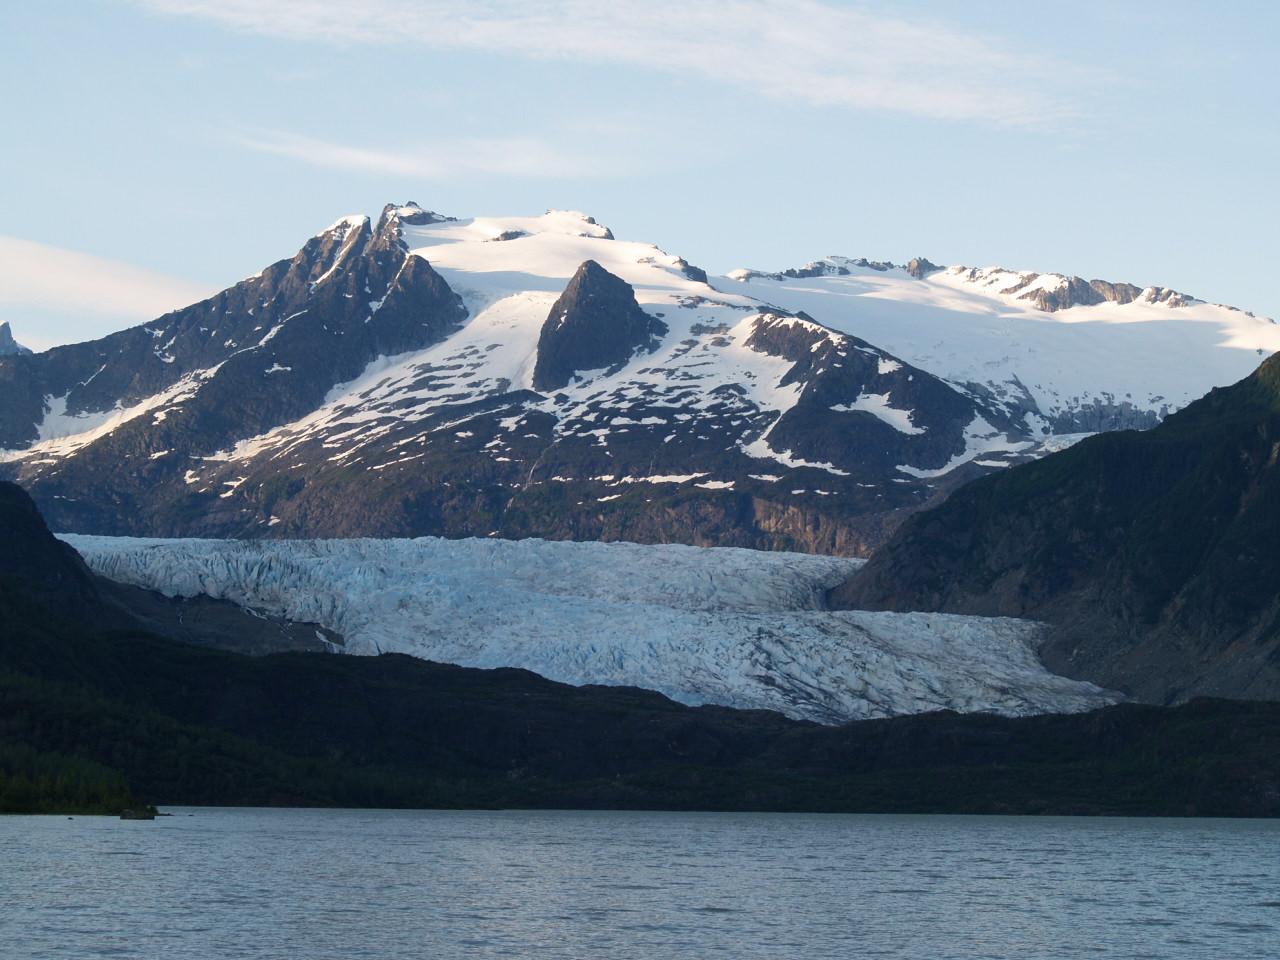 Mendenhall Glacier from across Mendenhall Lake